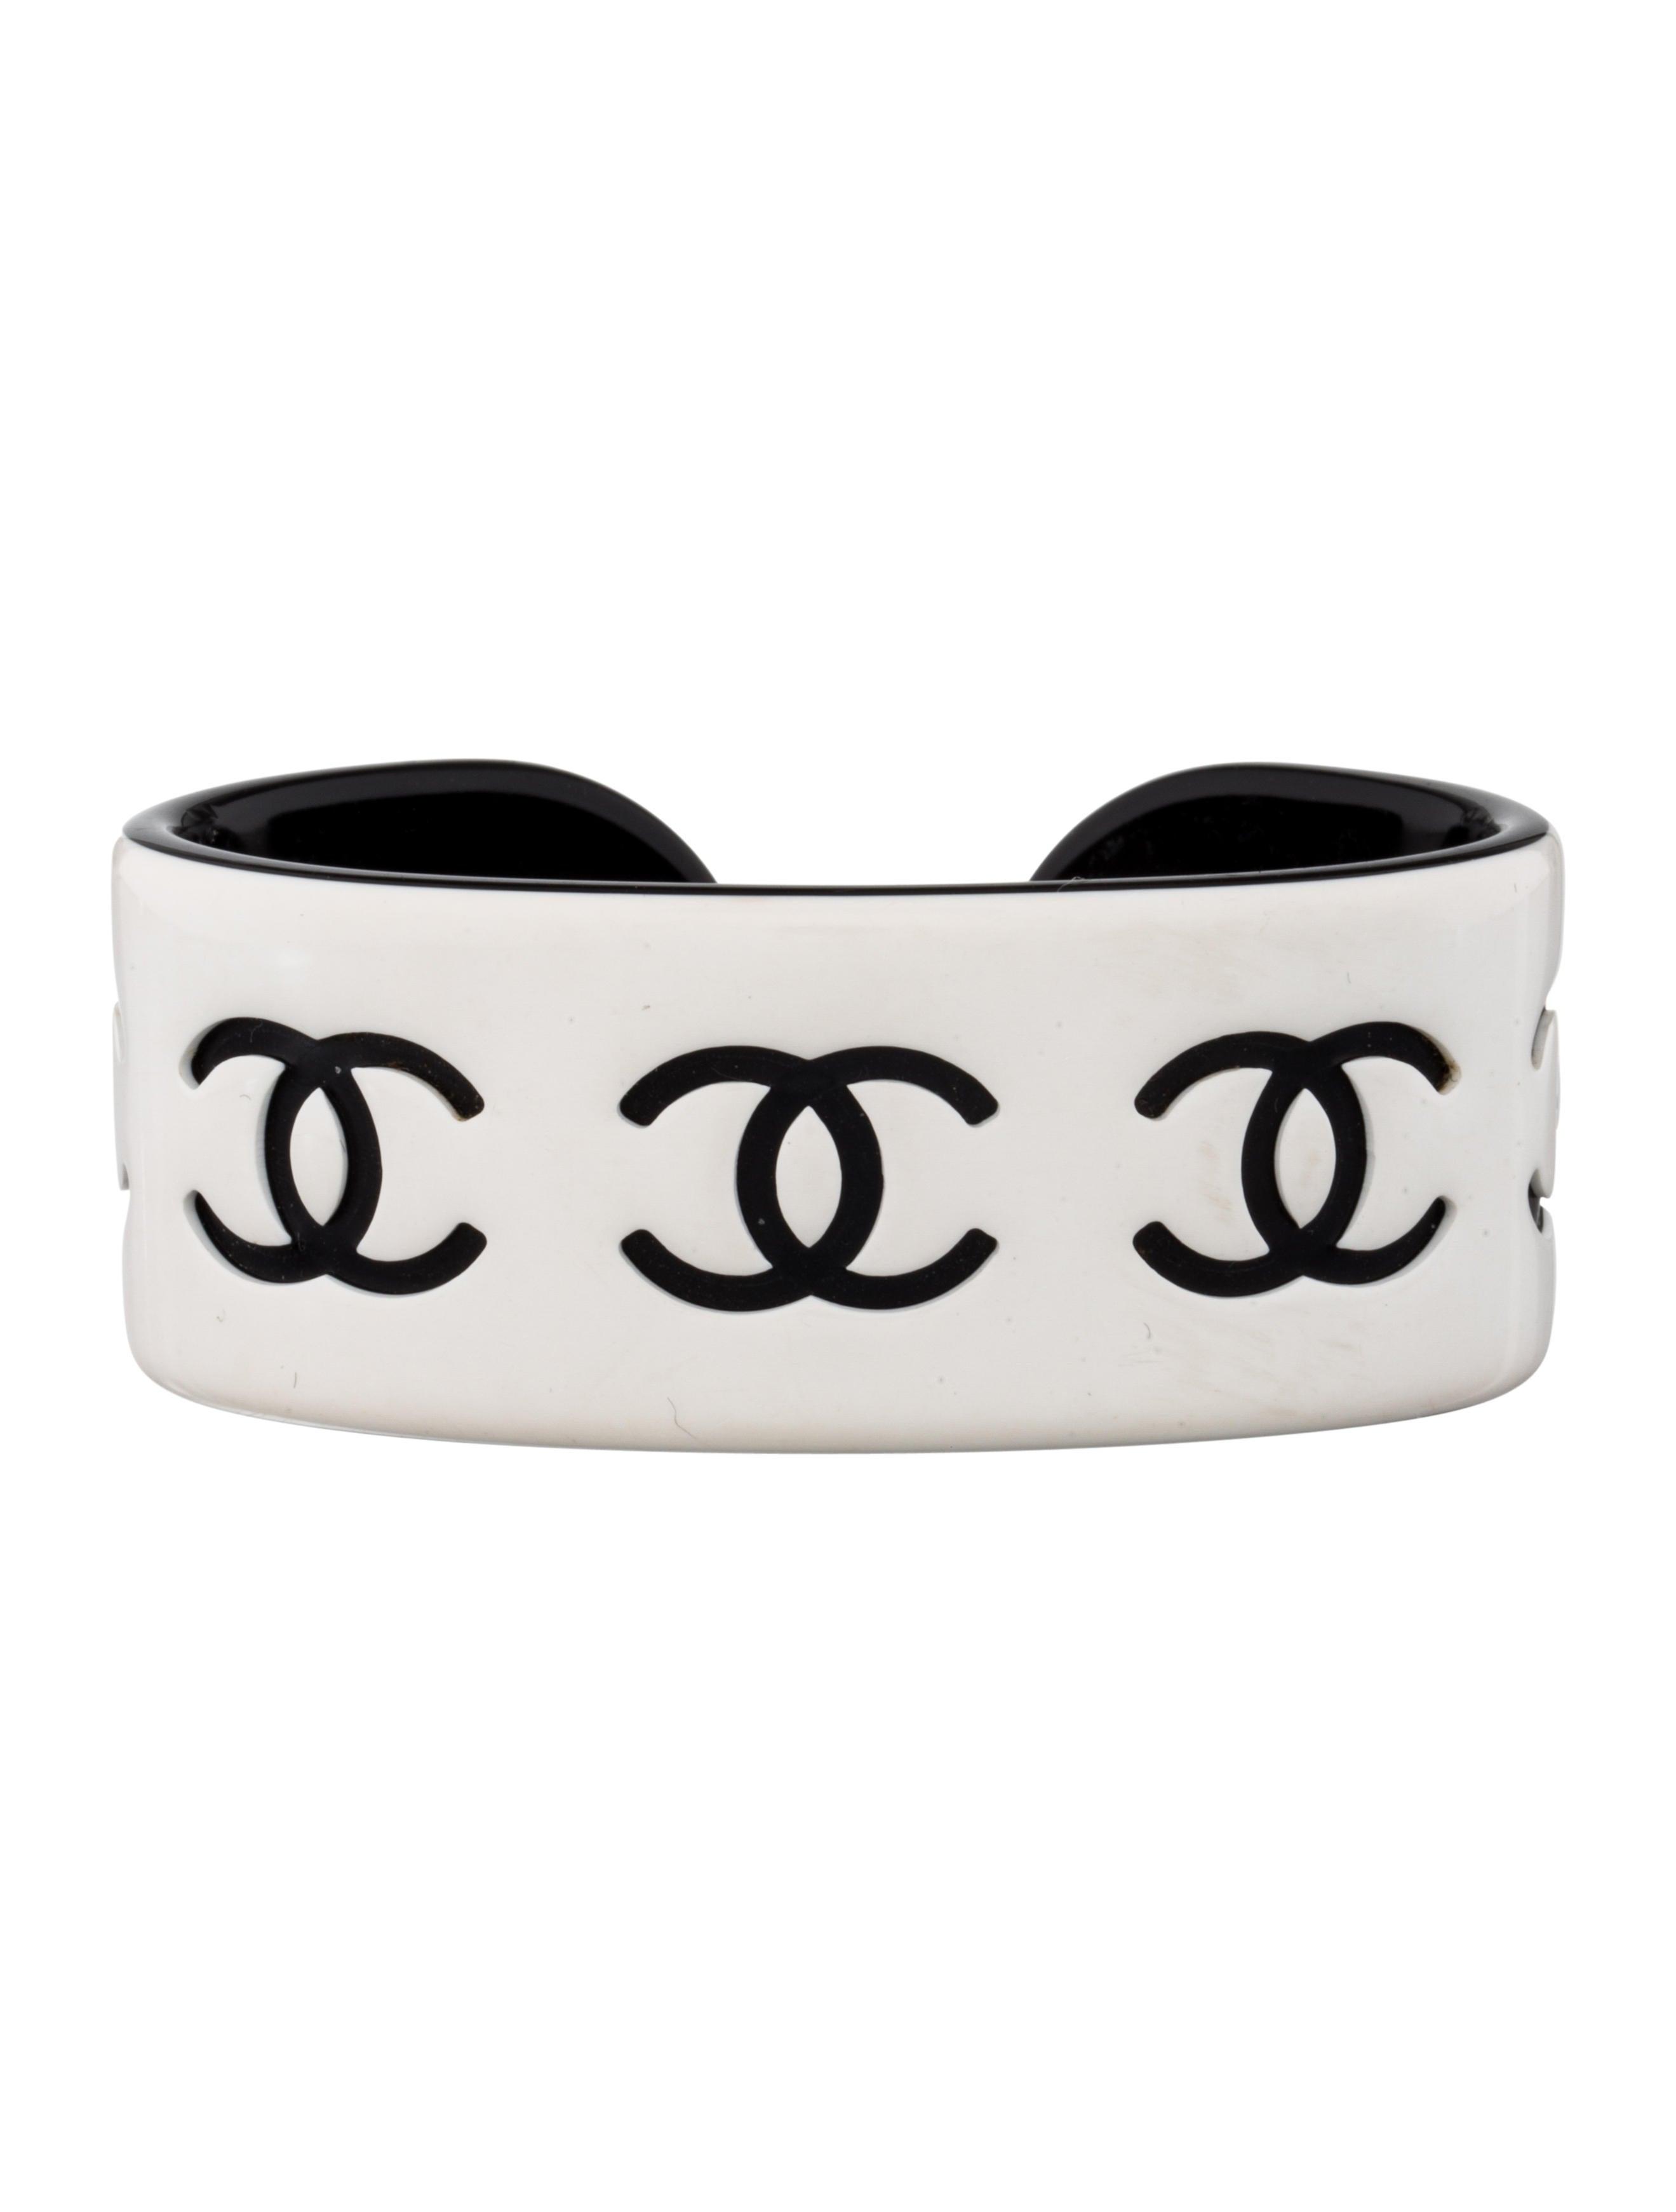 c7291a40958 Chanel Resin CC Cuff - Bracelets - CHA82012